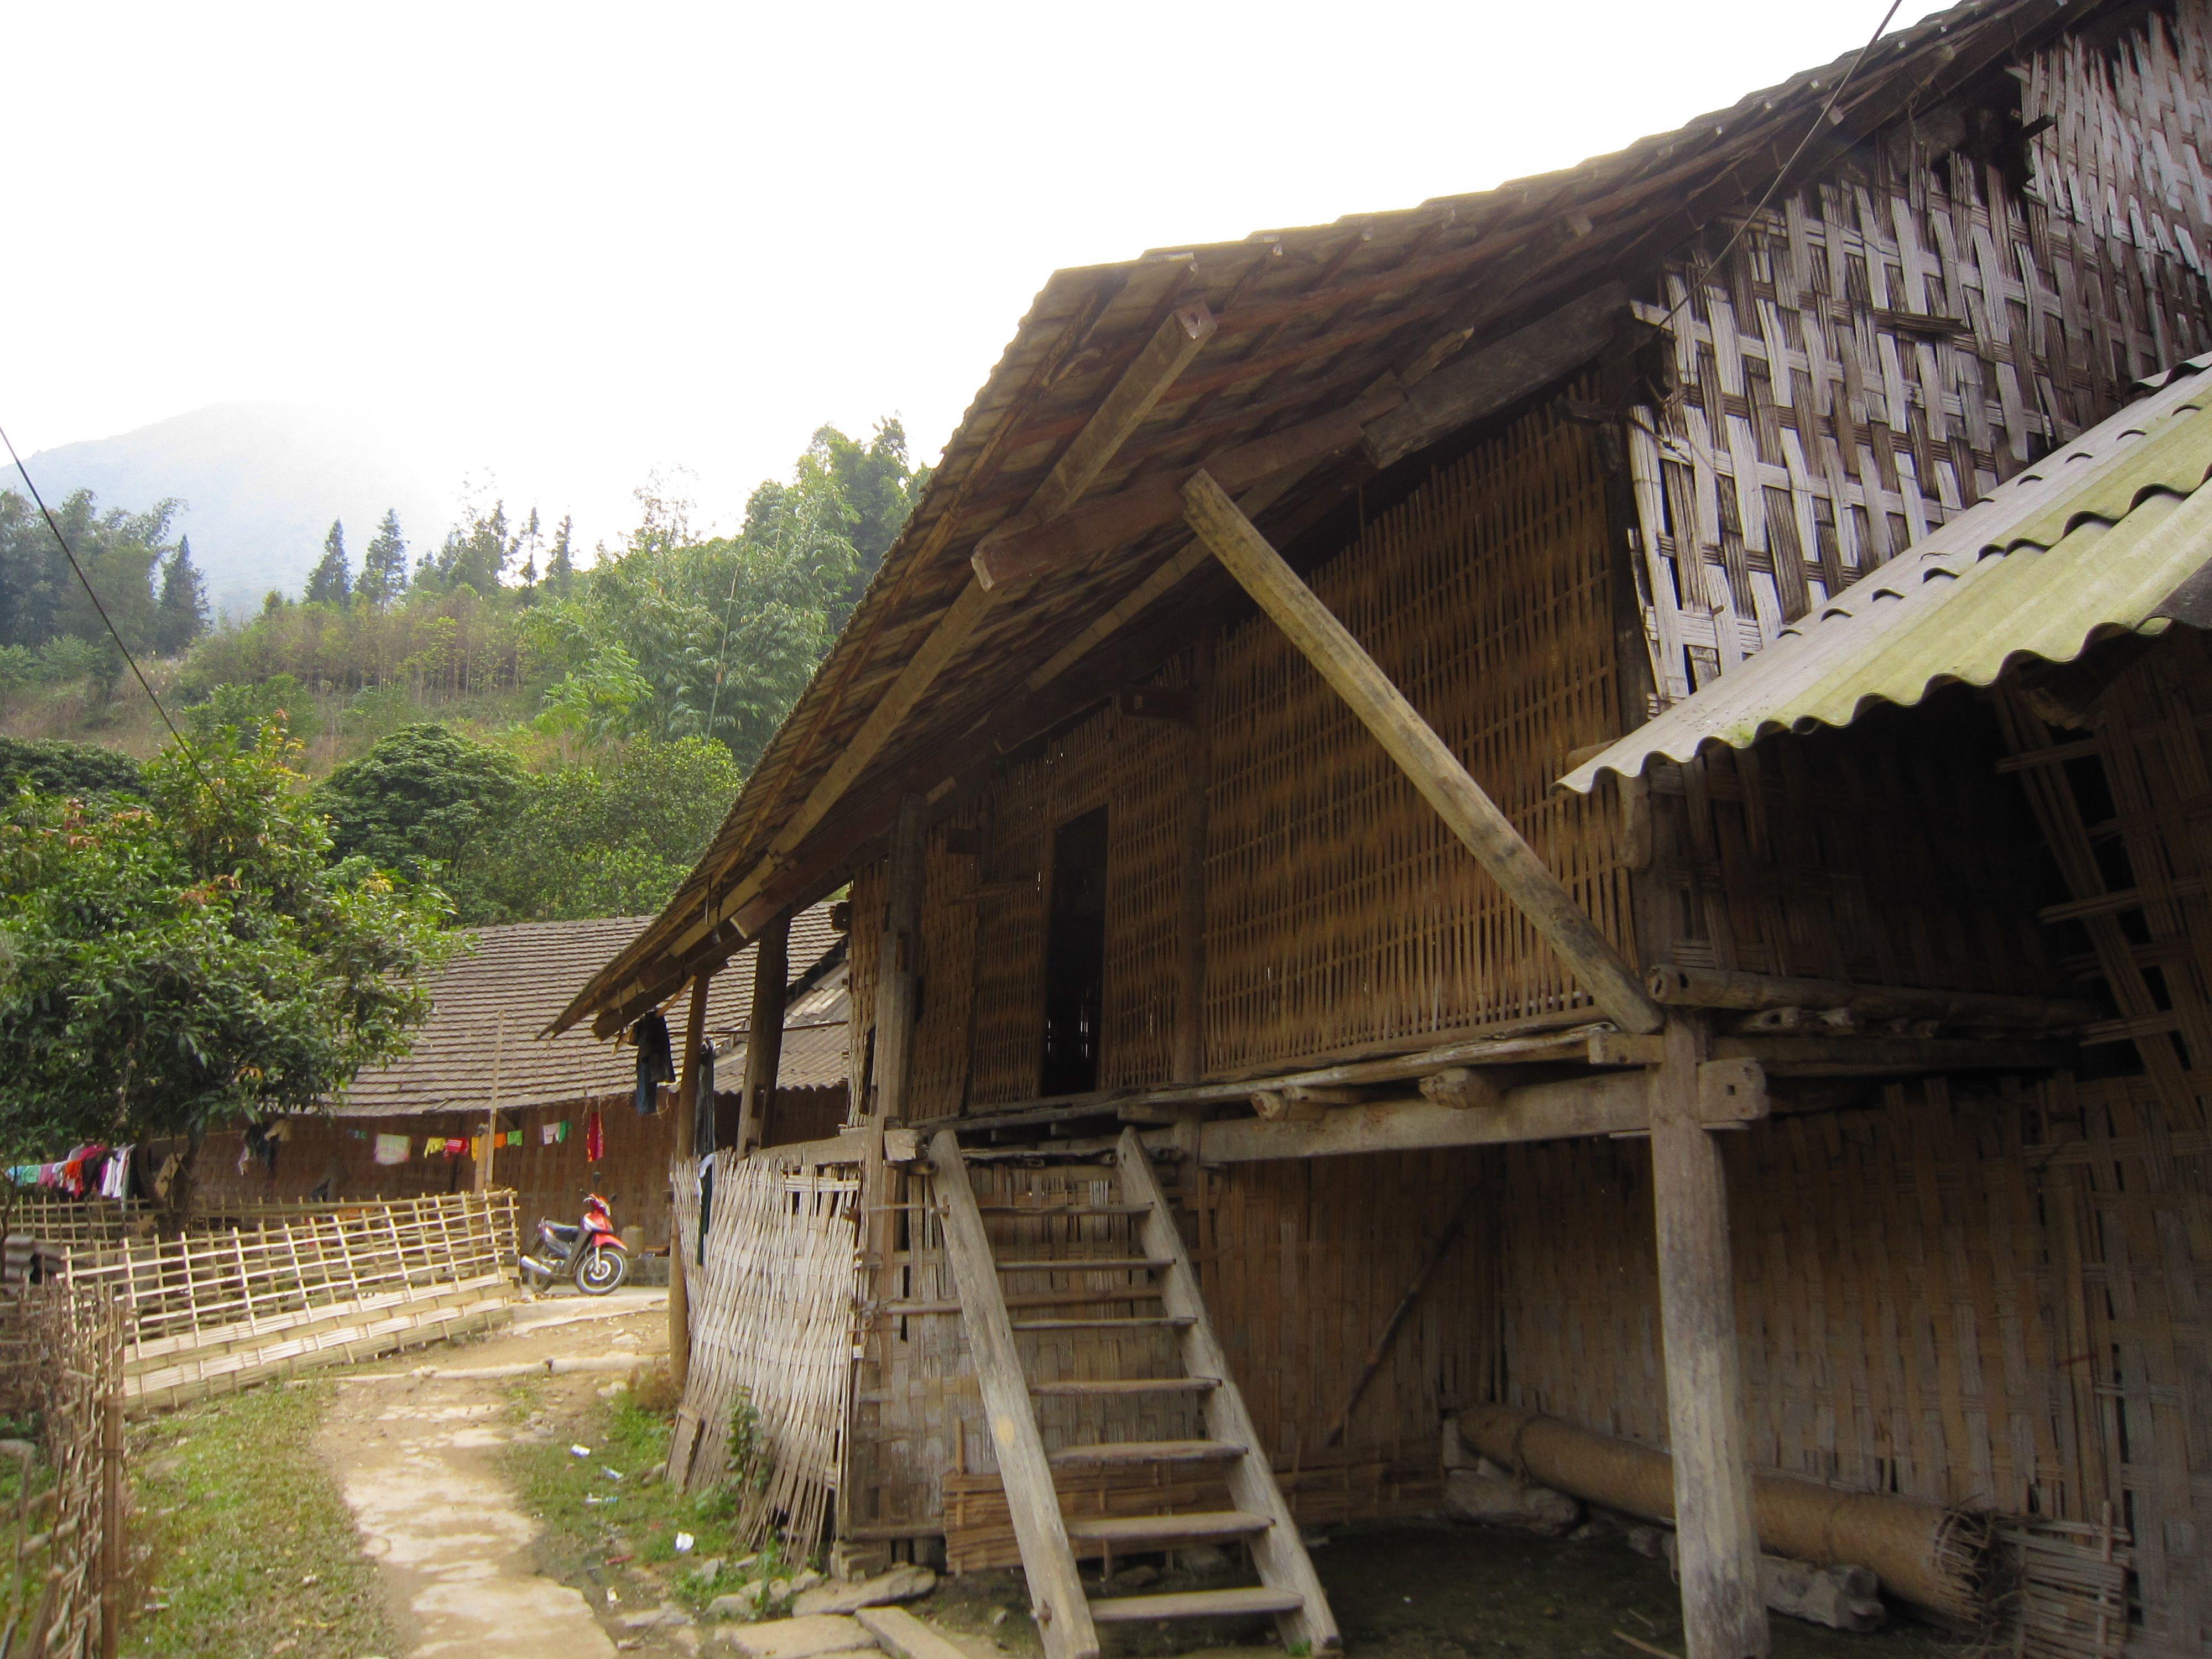 Traveling in northern Vietnam. Ban Ho village. www.north-vietnam.com... #vietnam #trekking #travel #wander #nature #mountains #hmong